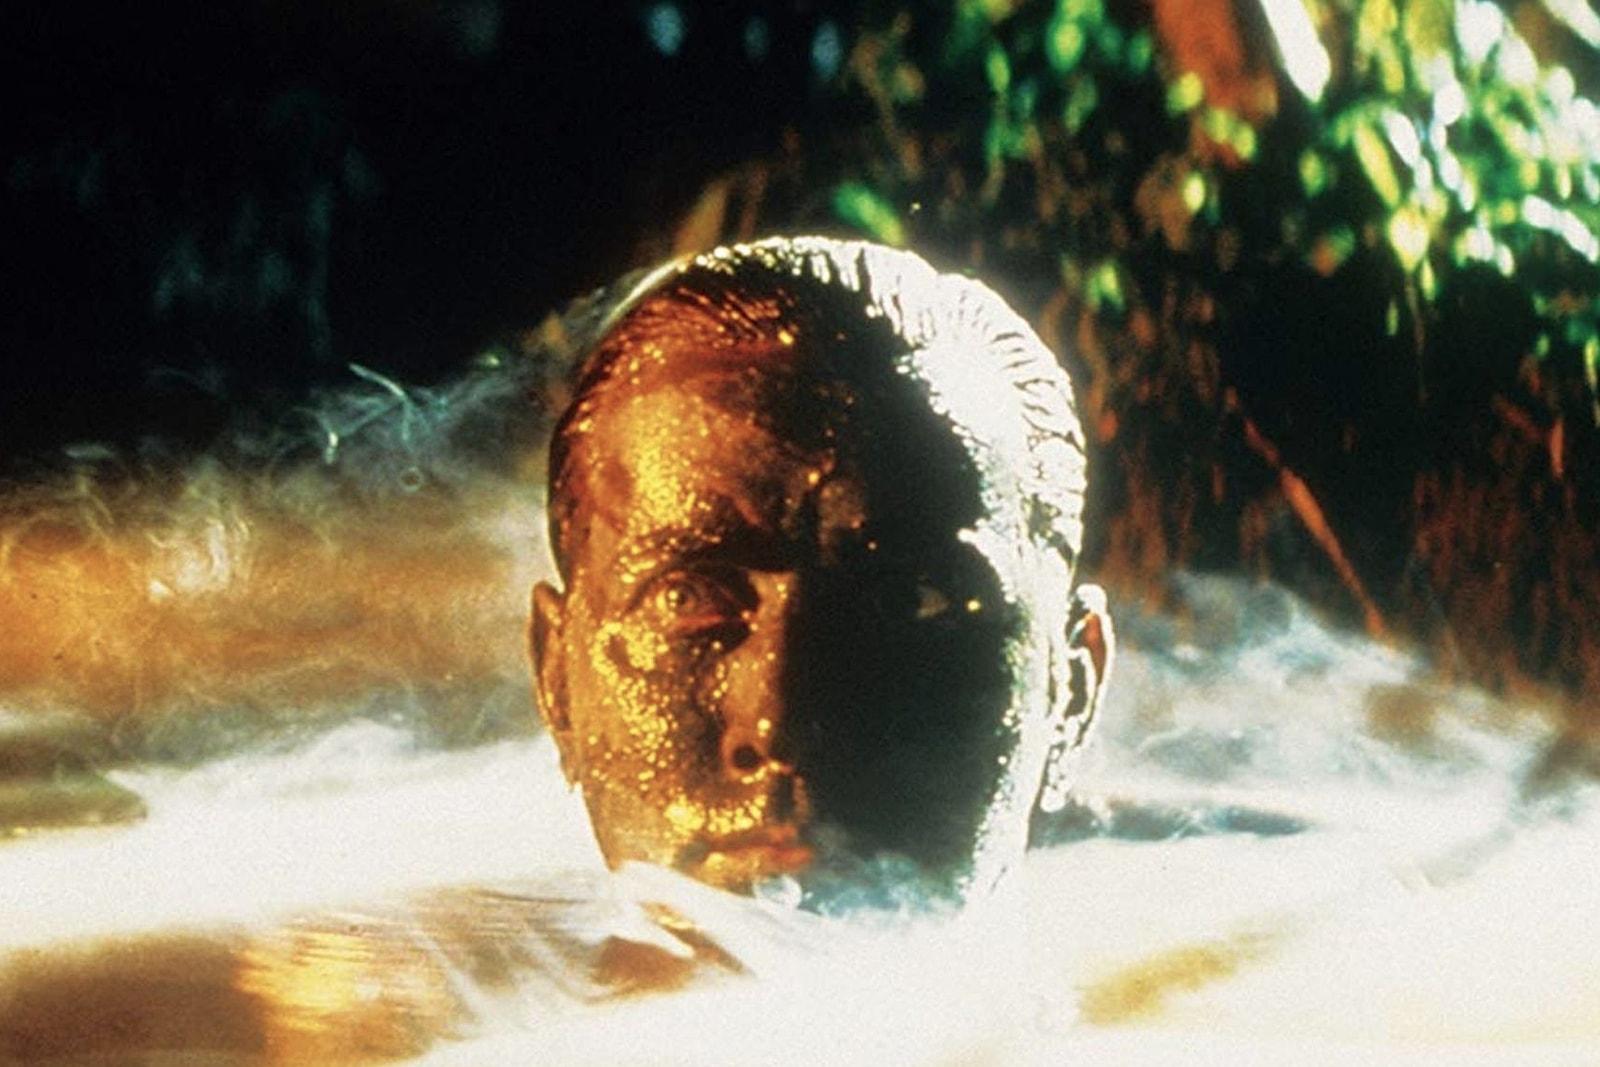 Hedi Slimane 最愛的這 10 部電影,正在 MUBI 免費放映中